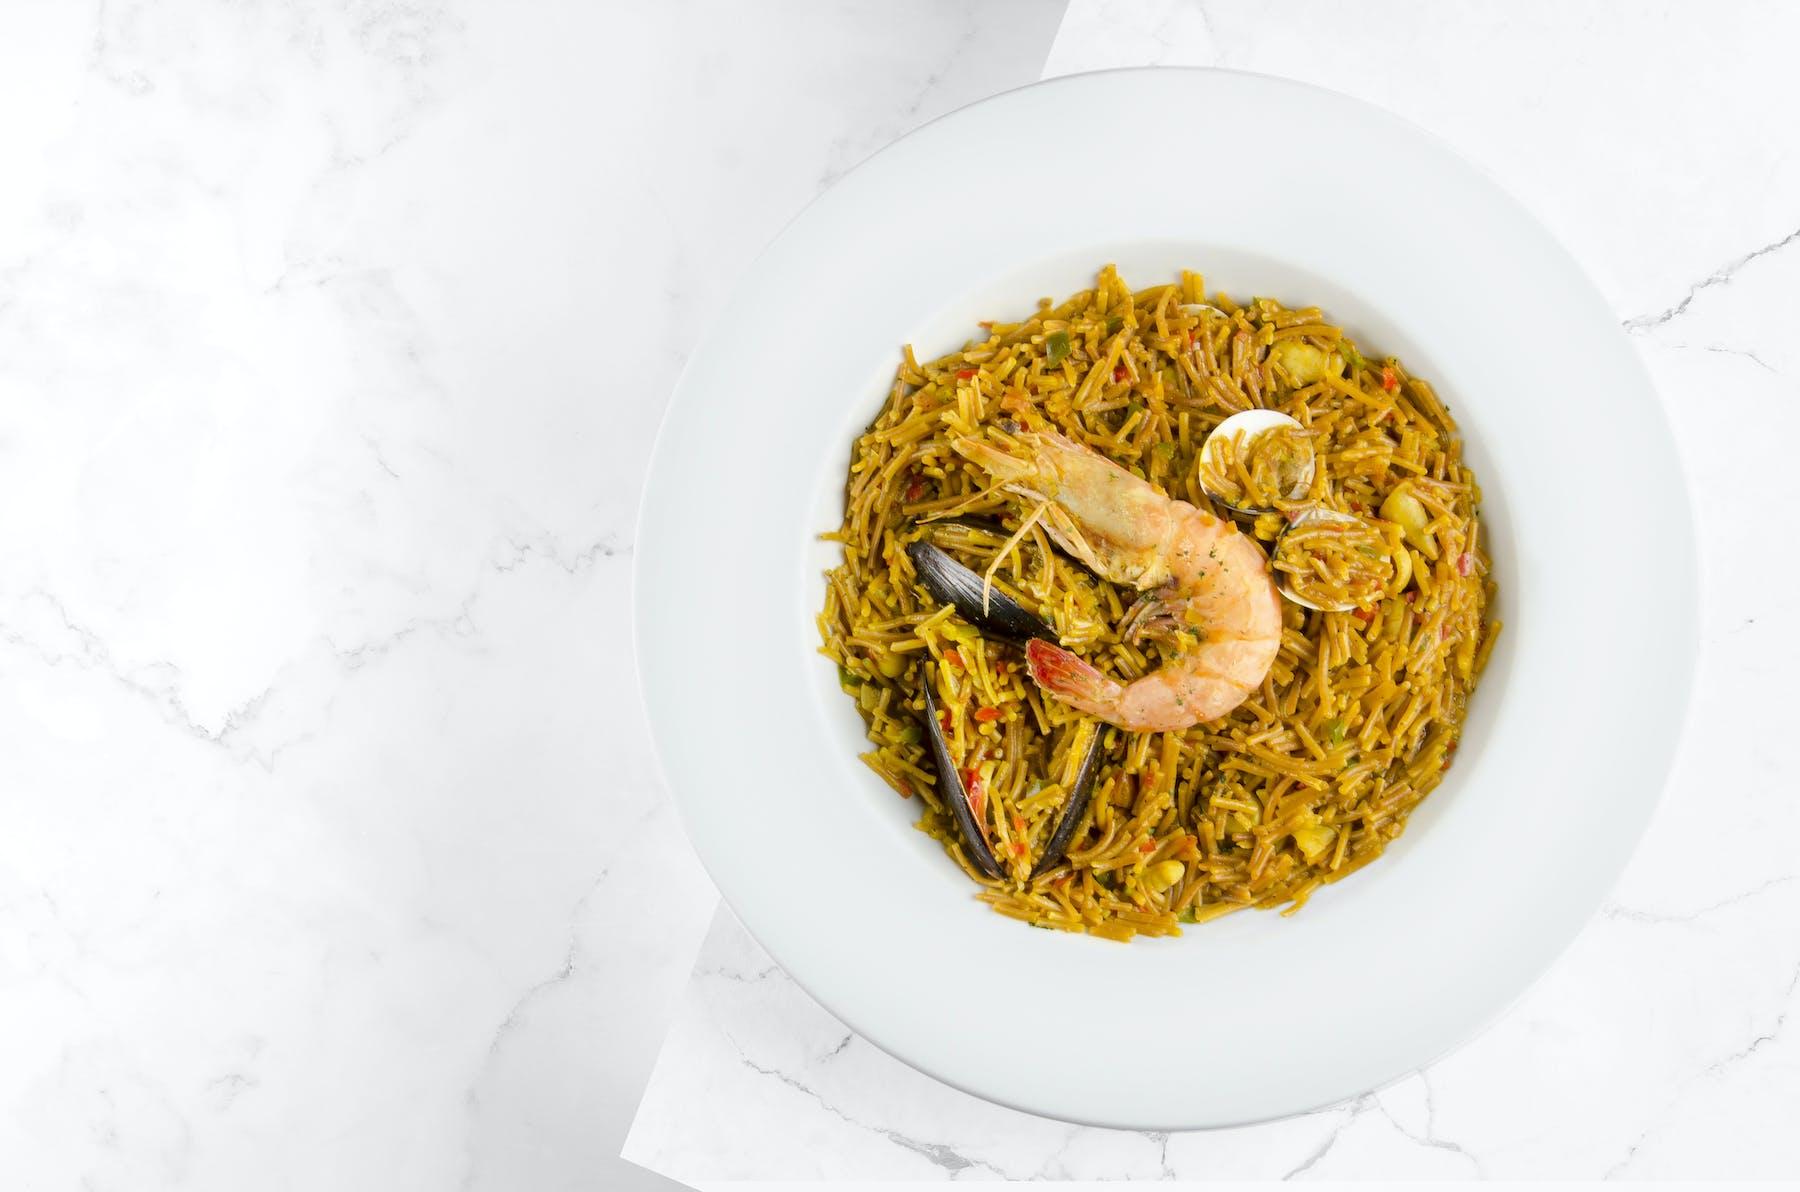 arroz con camamron